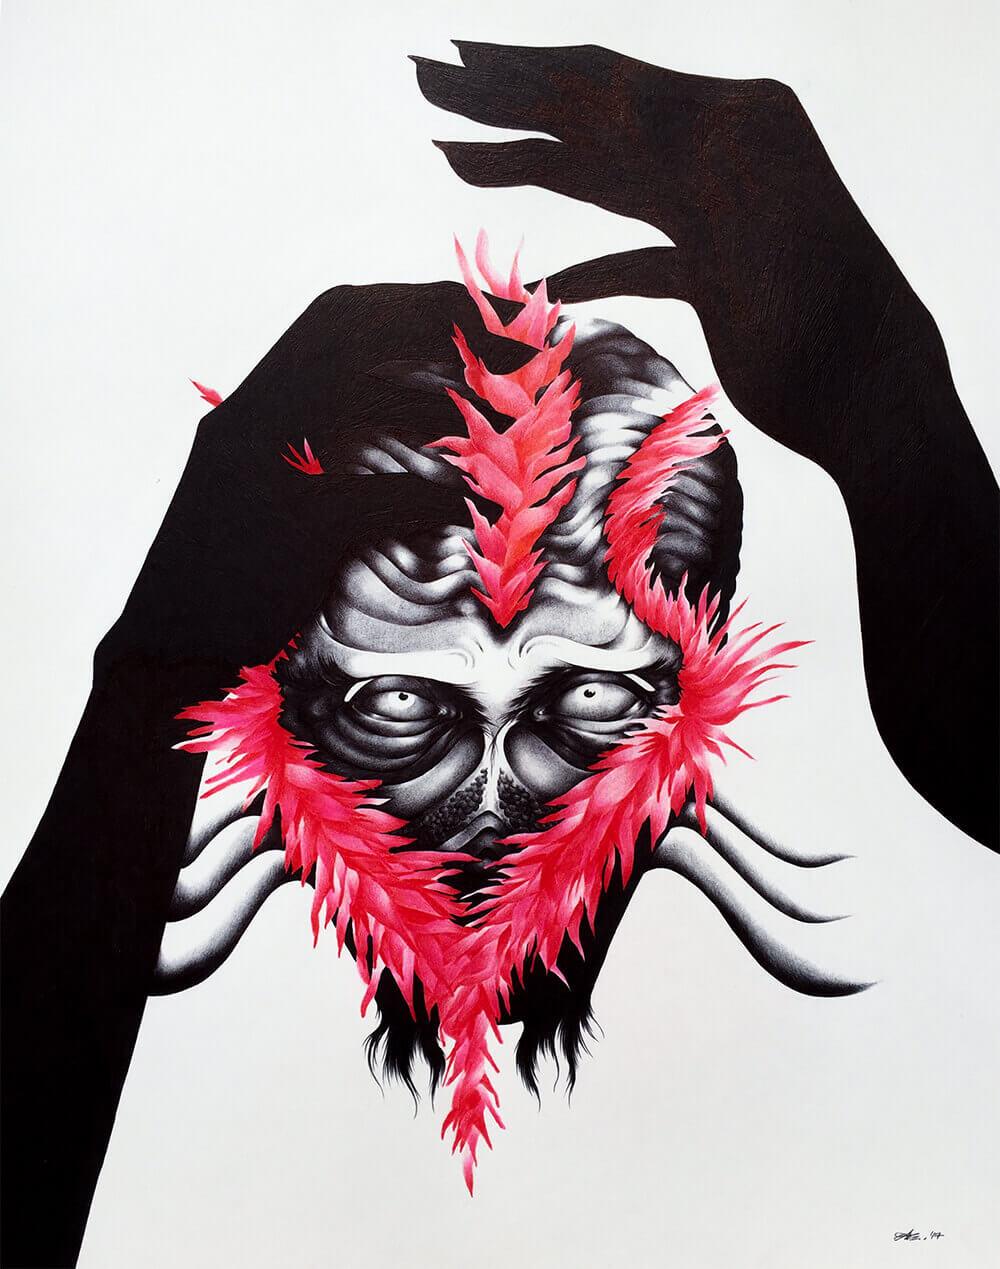 Creature #4 Medium: Black Ballpoint Pen, Watercolor, and Colored Pencil